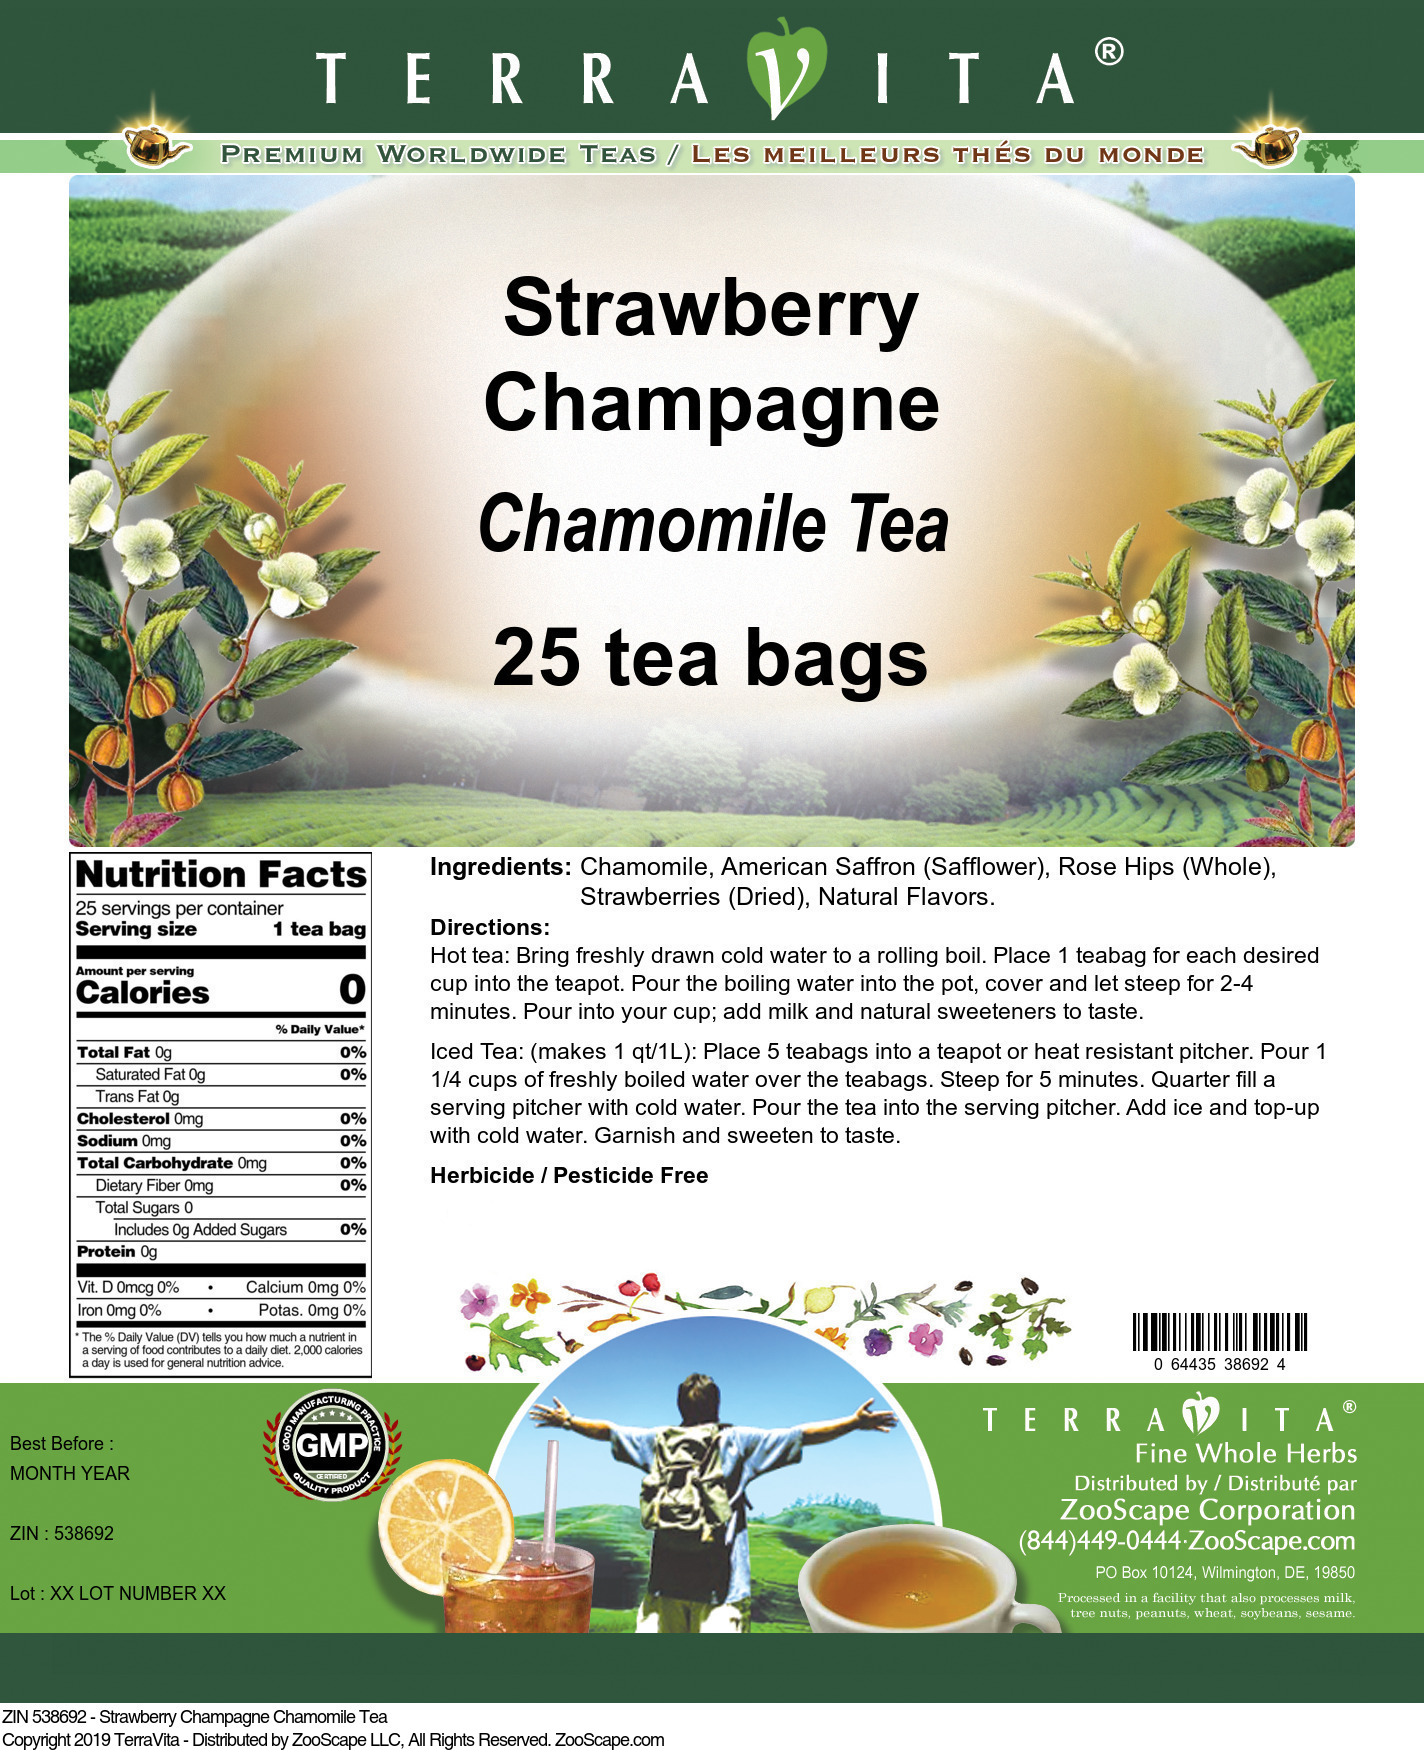 Strawberry Champagne Chamomile Tea